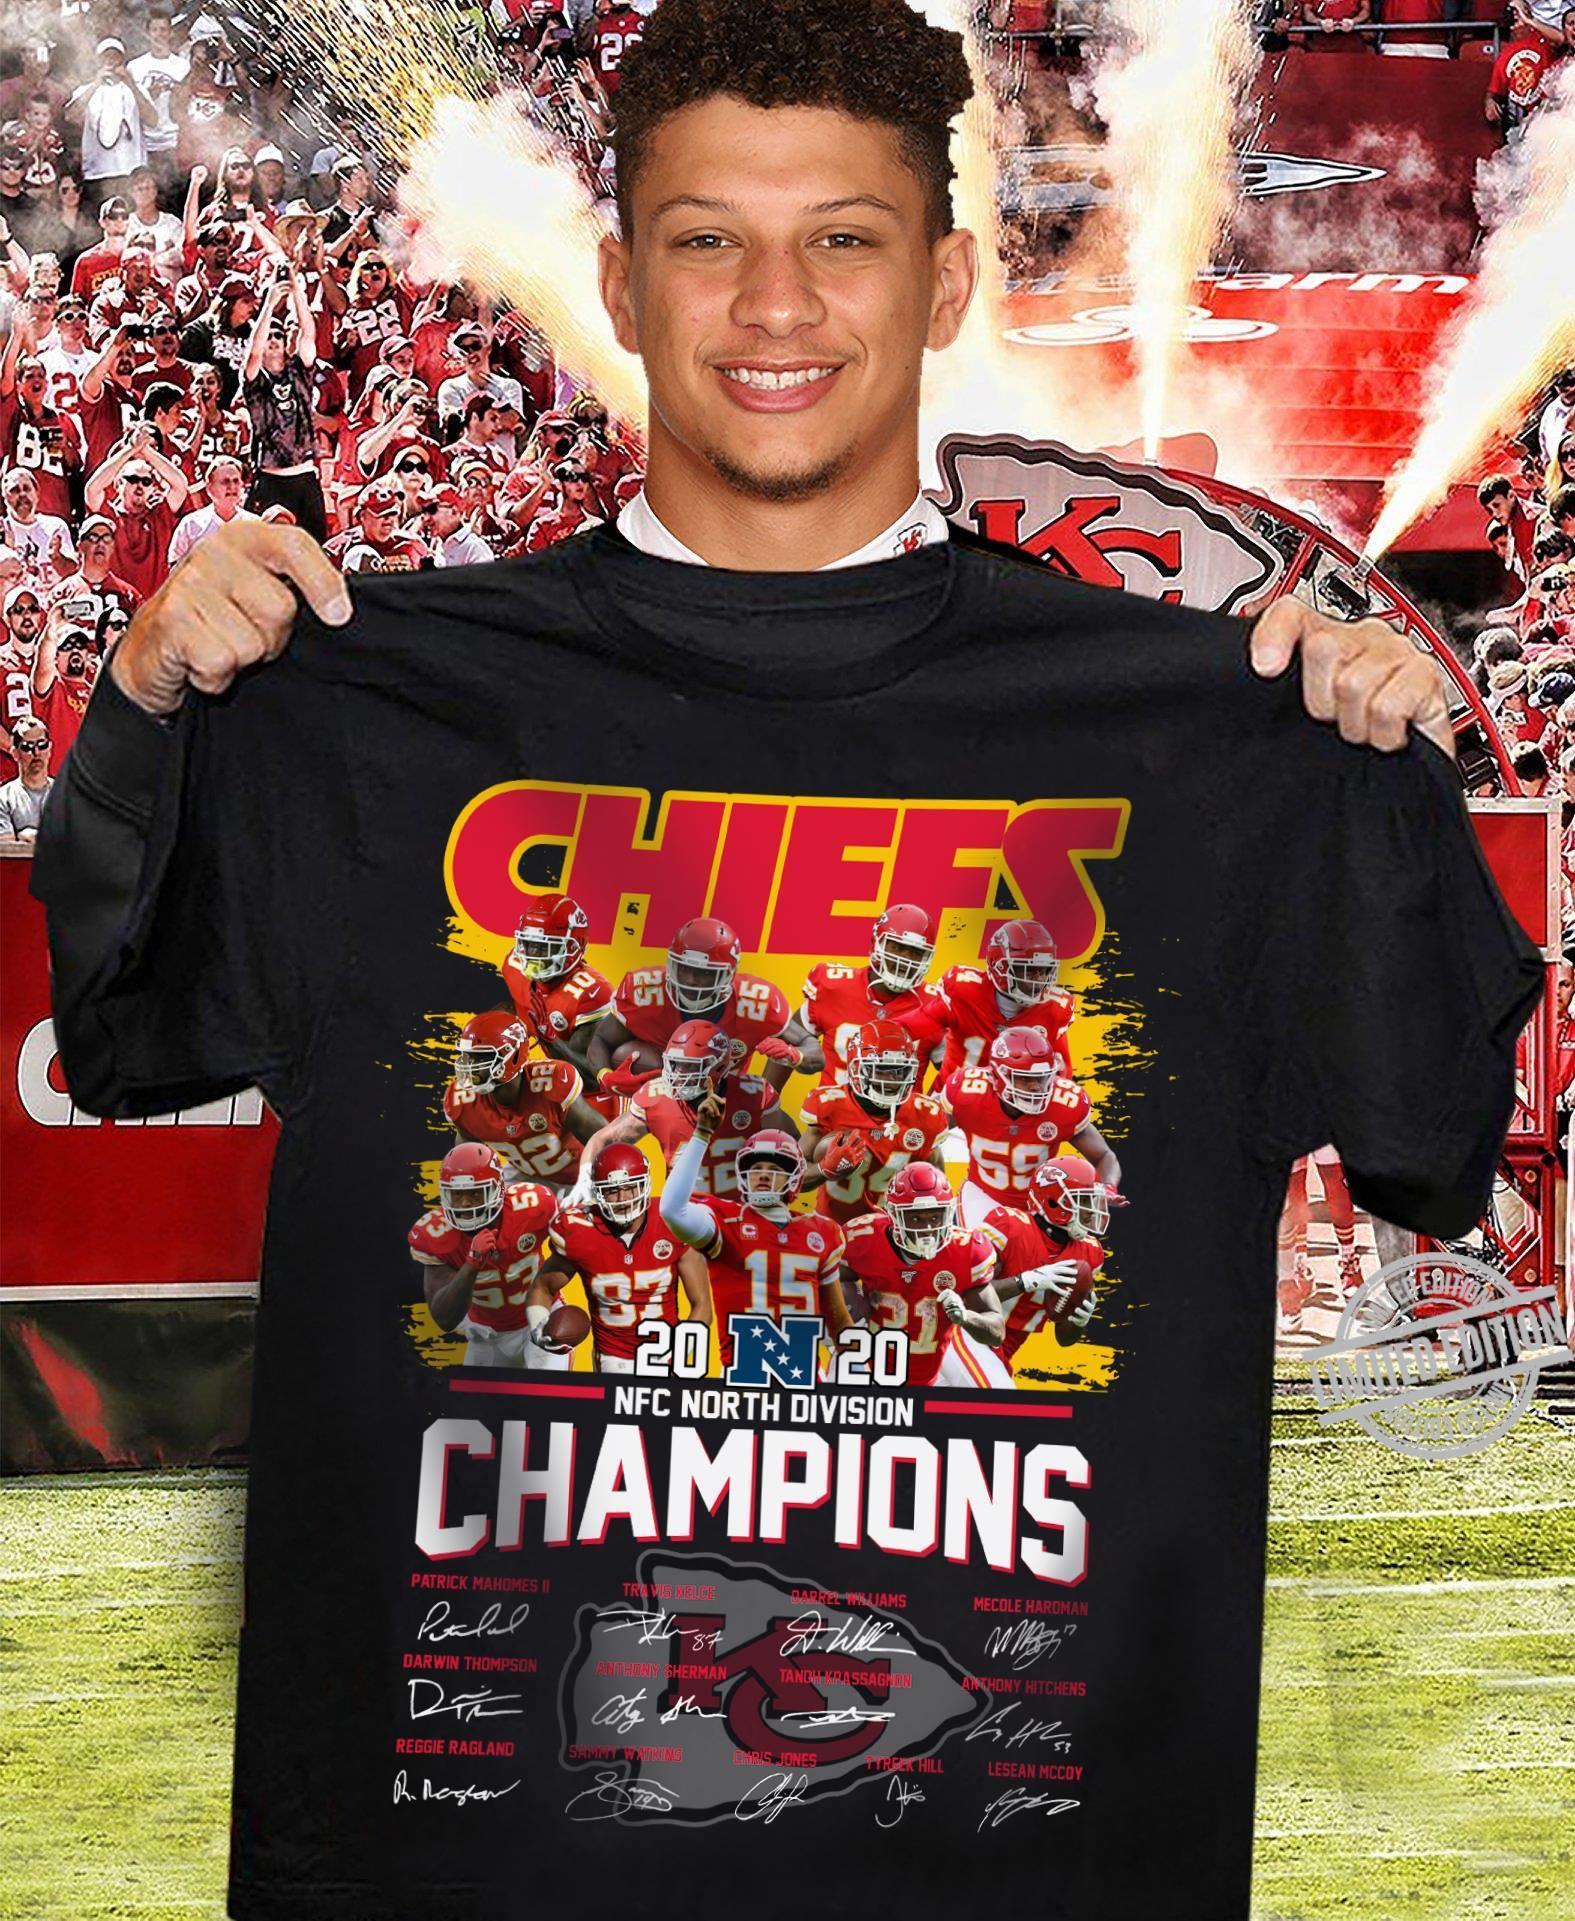 NFC North Divsion Champions Shirt